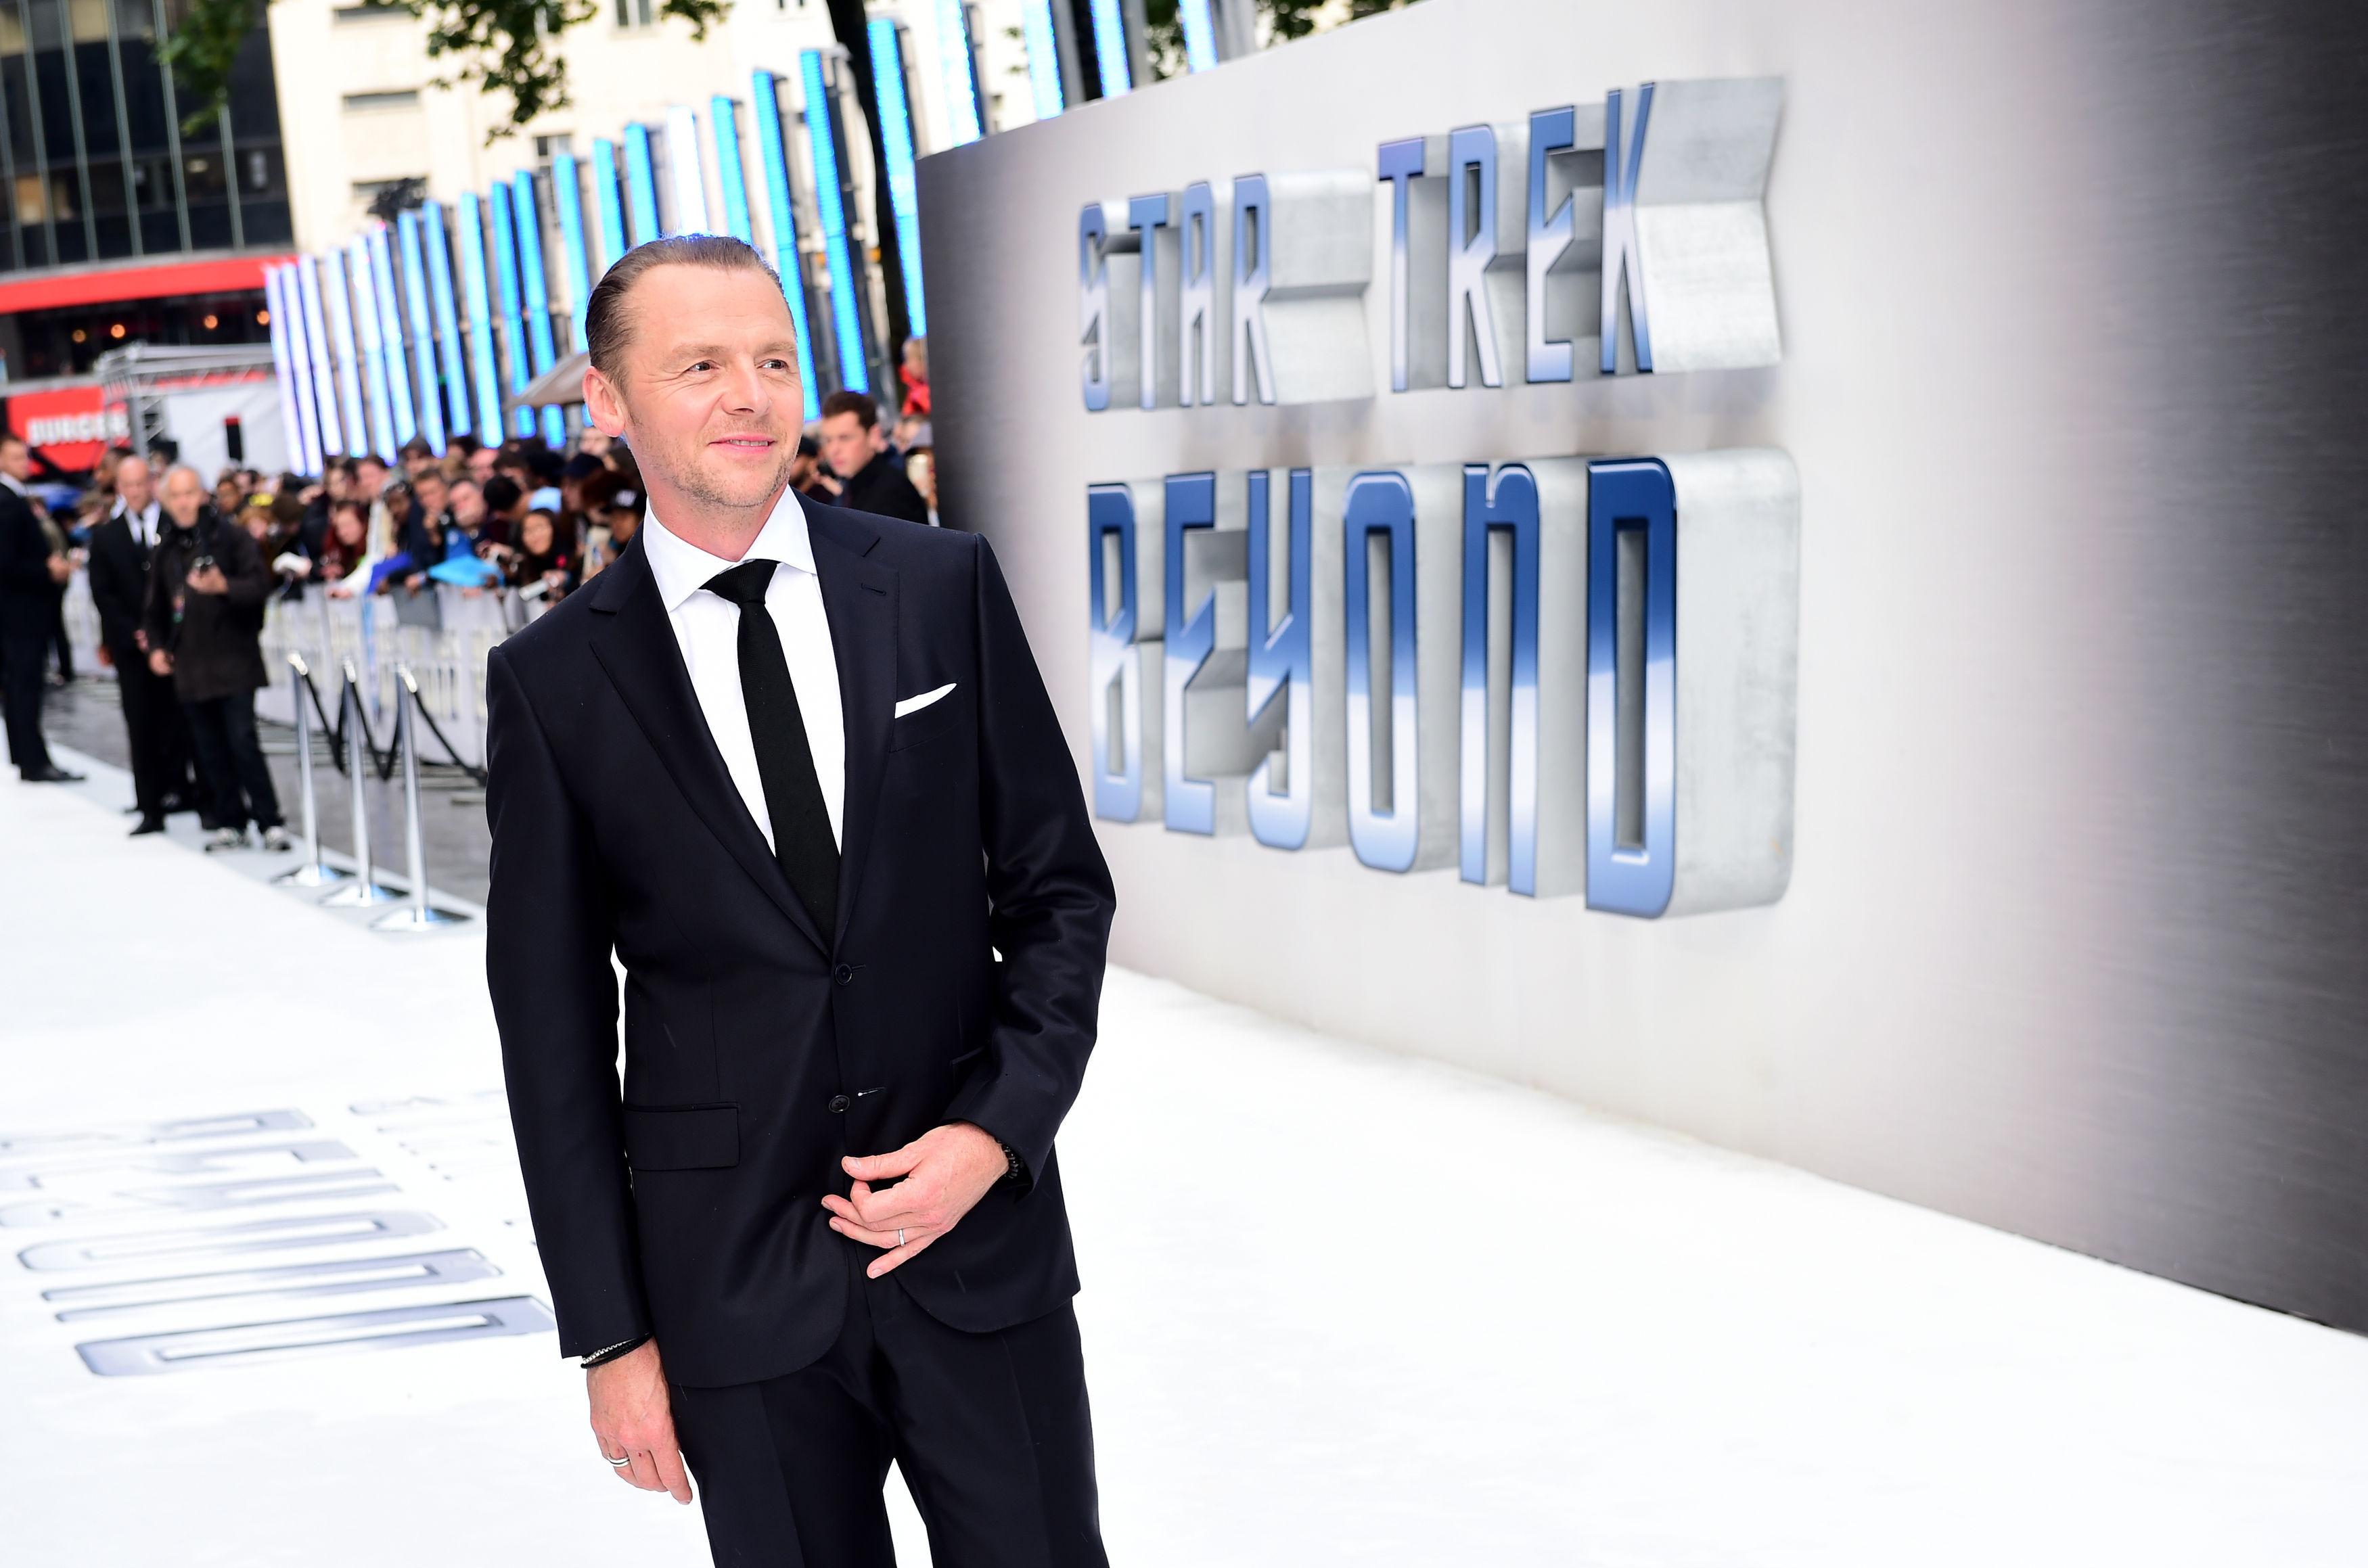 Star Trek Beyond actor Simon Pegg has this piece of leadership advice for Theresa May